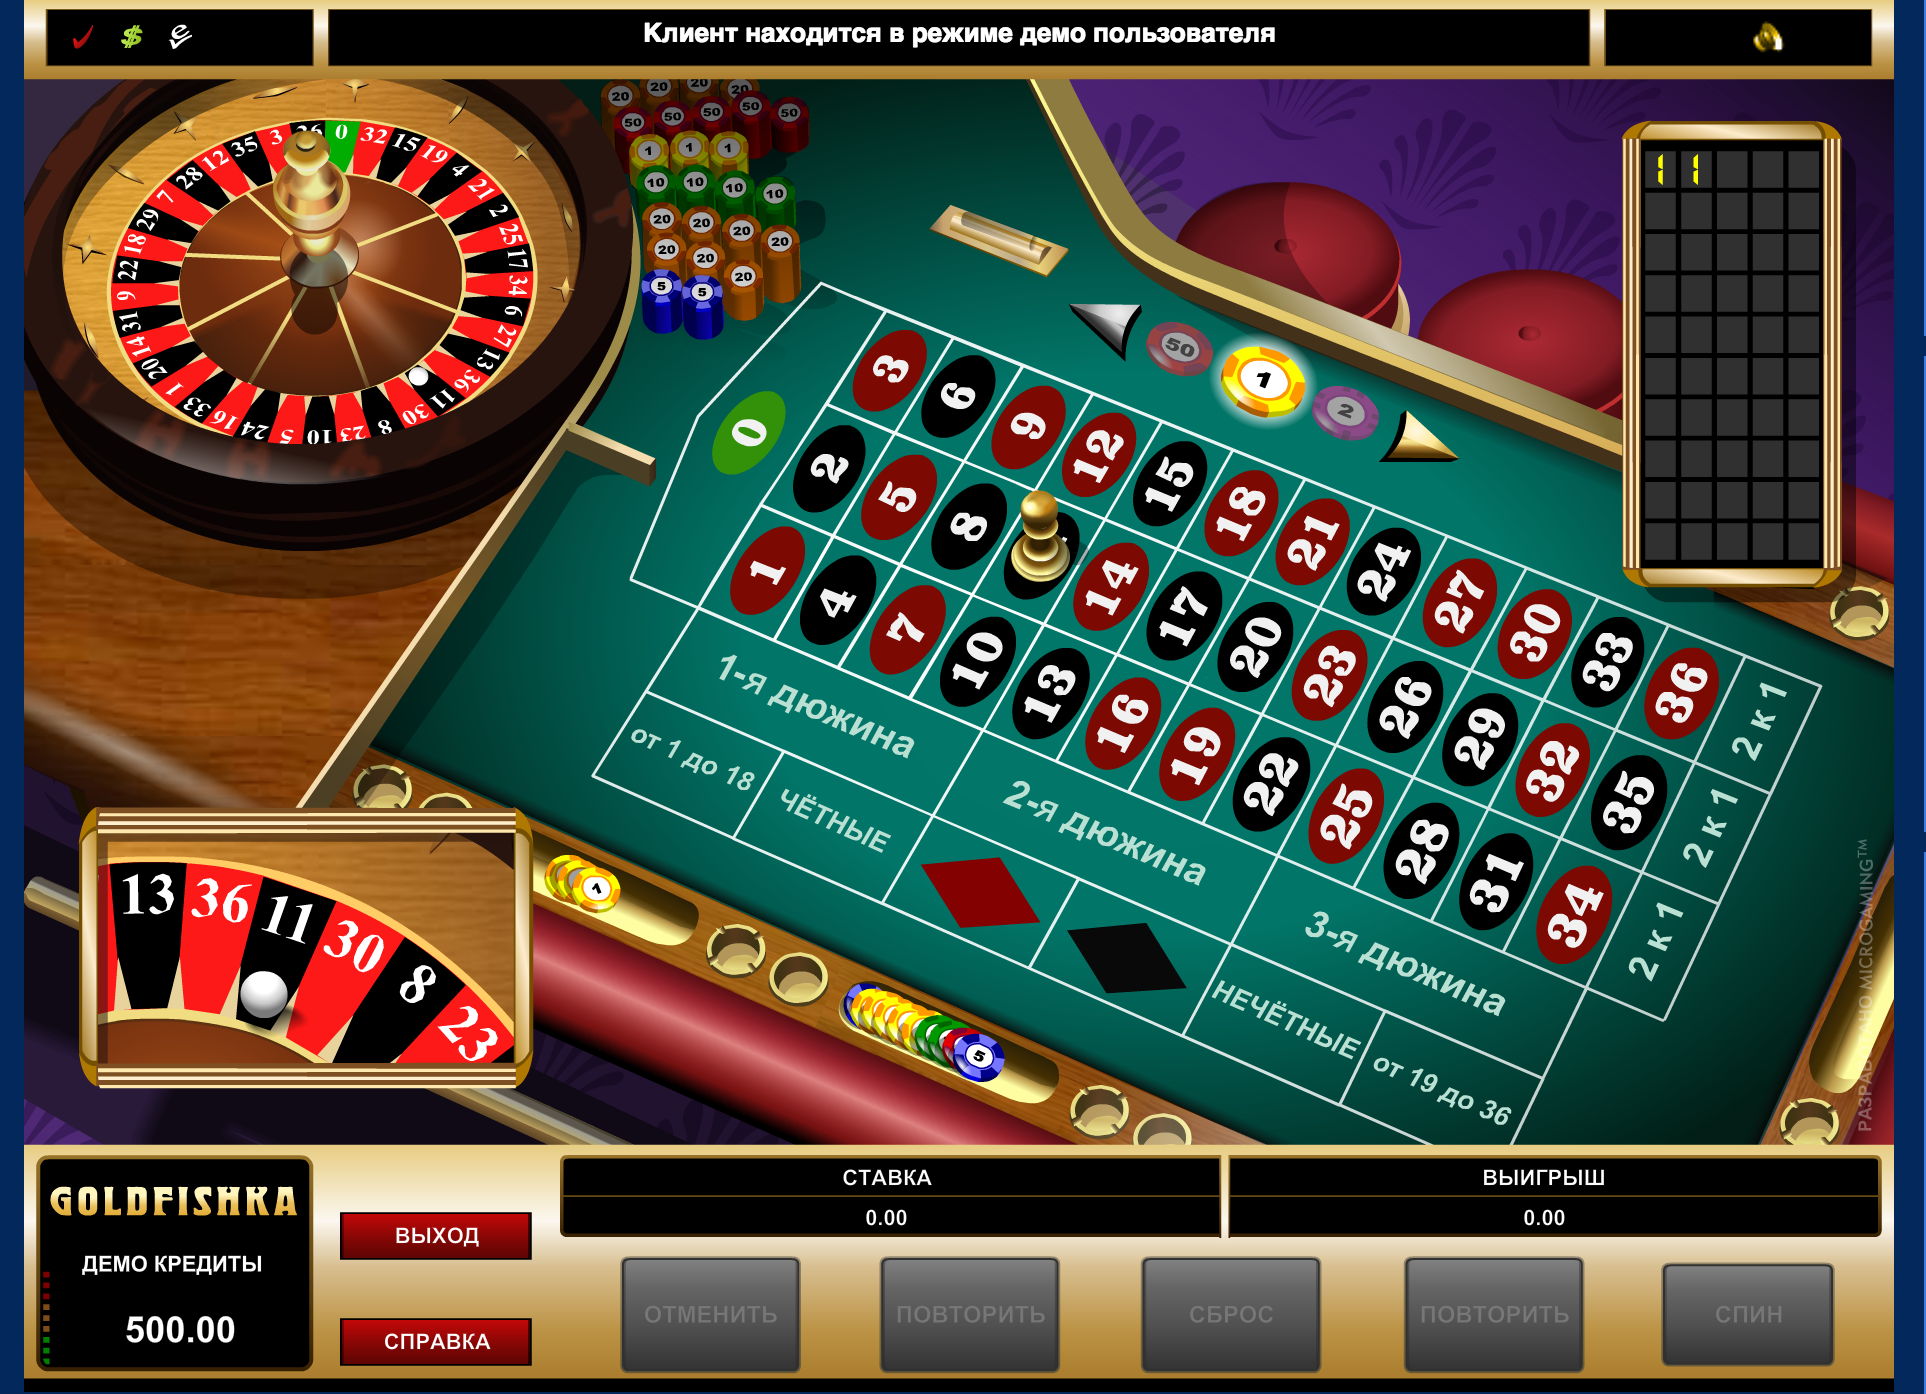 Казино адмирал онлайн рулетка стратегии как обыграть онлайн рулетку